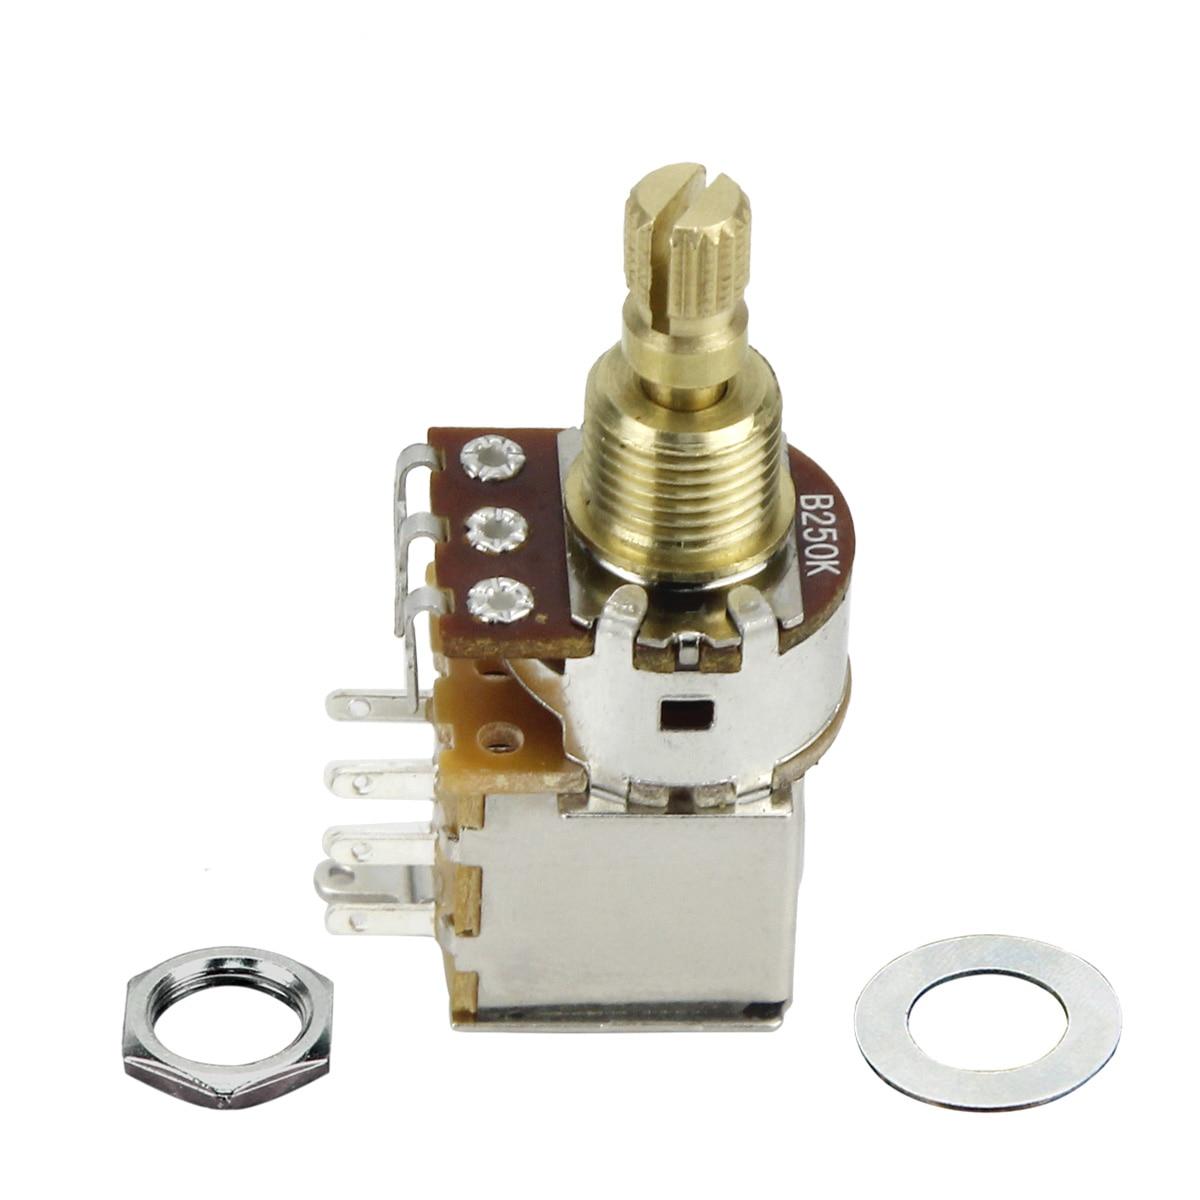 small resolution of fleor 1pcs b250k guitar potentiometer push push potentiometer dpdt switch linear tape short split shaft don t pull anymore